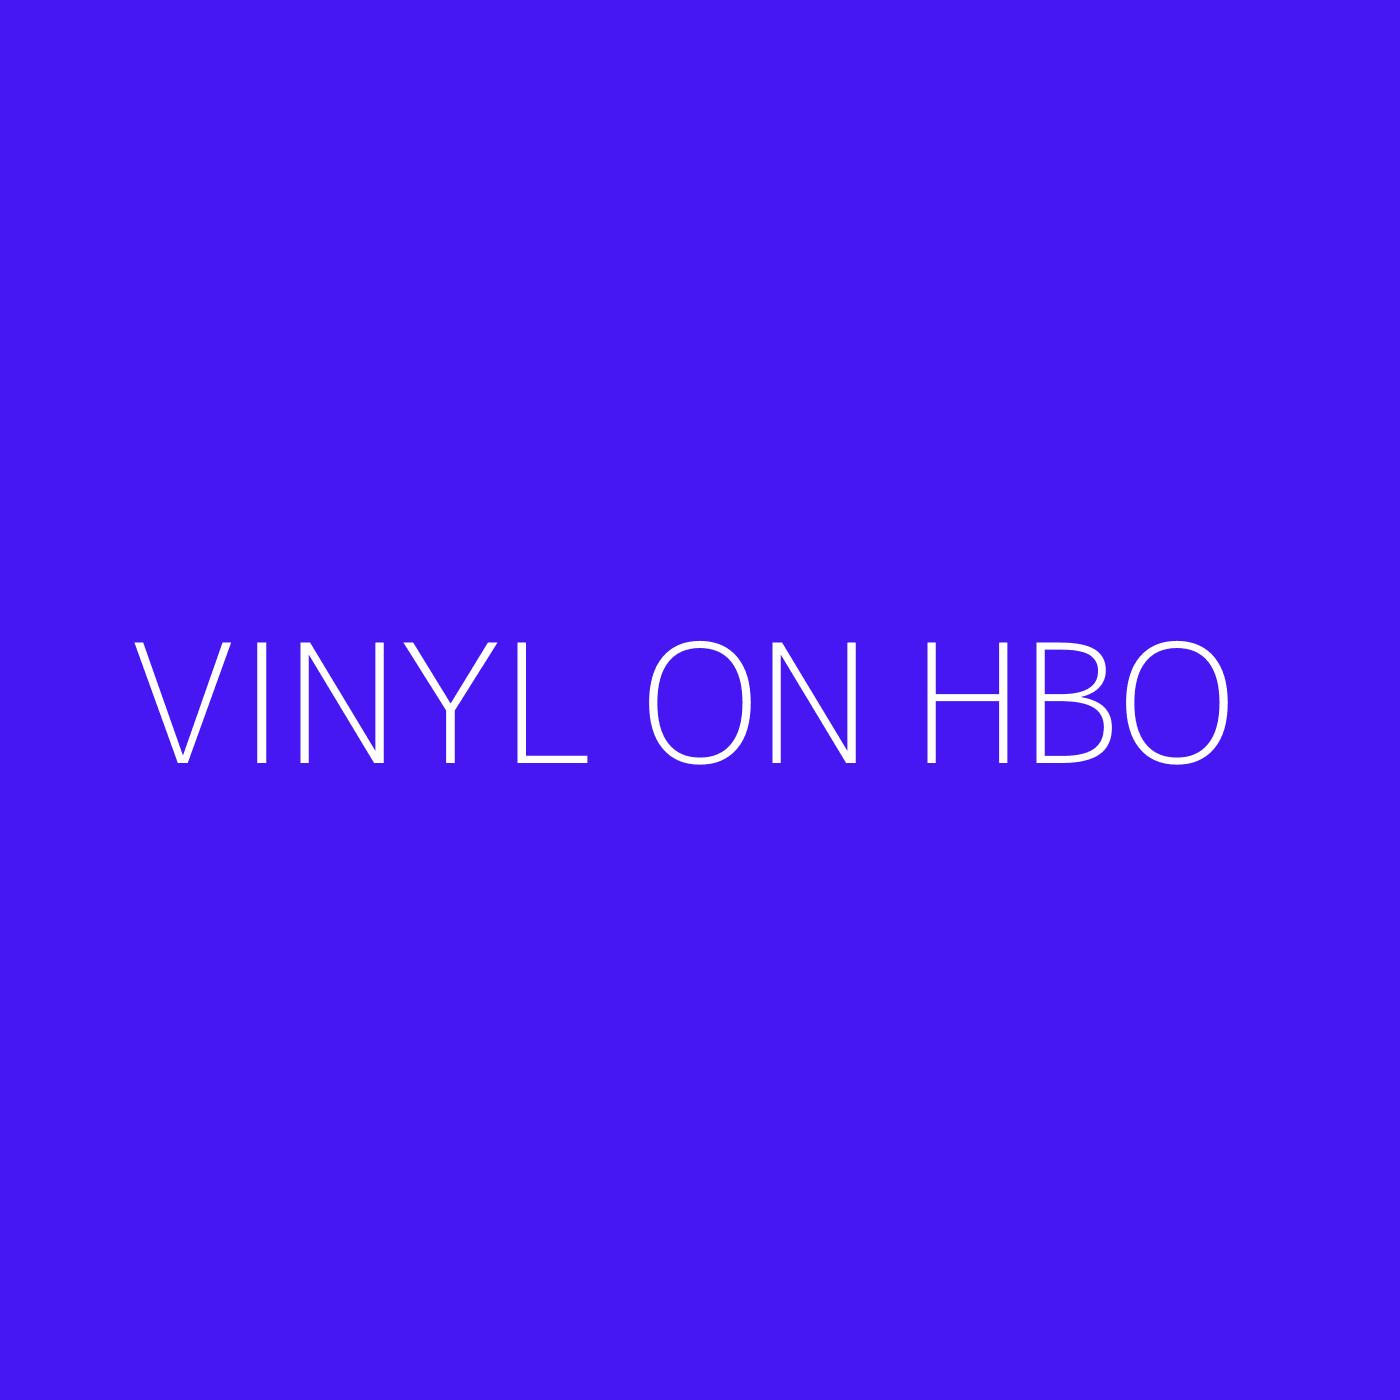 Vinyl on HBO Playlist Artwork